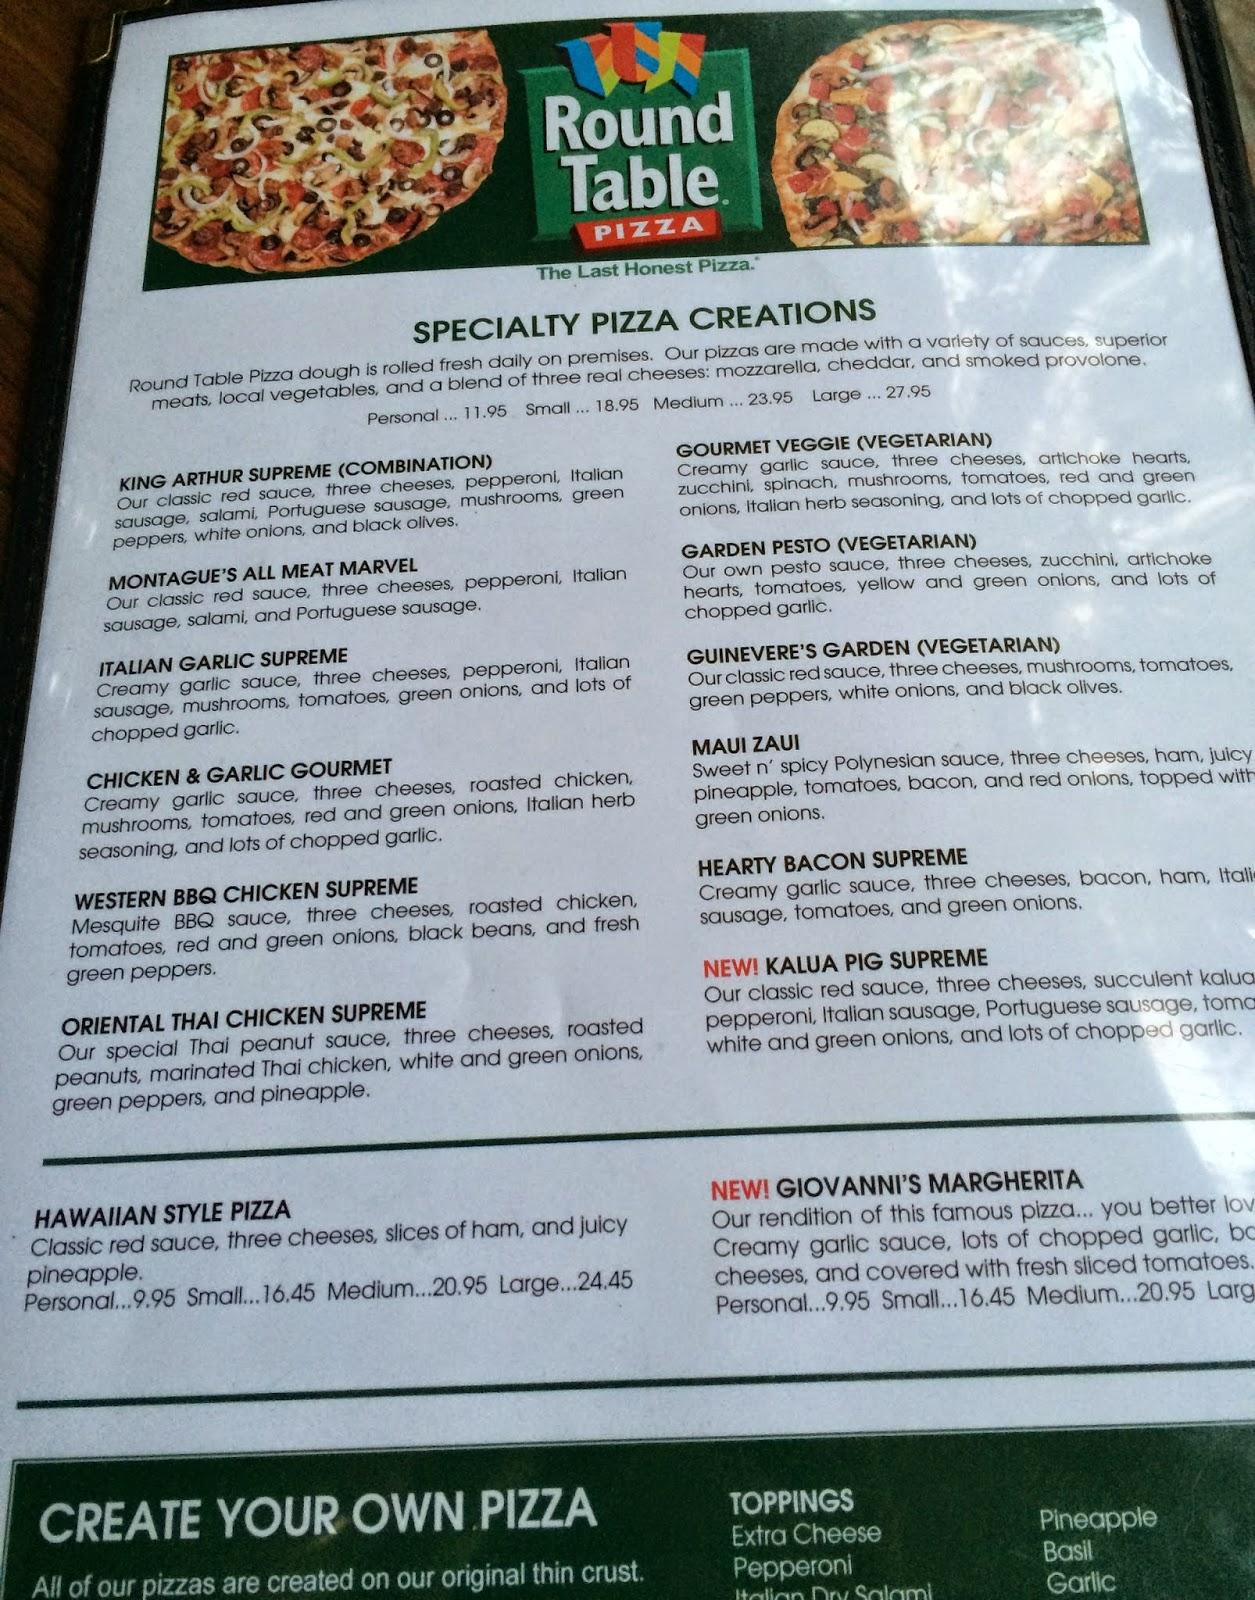 TASTE OF HAWAII: ROUND TABLE PIZZA WAIKIKI